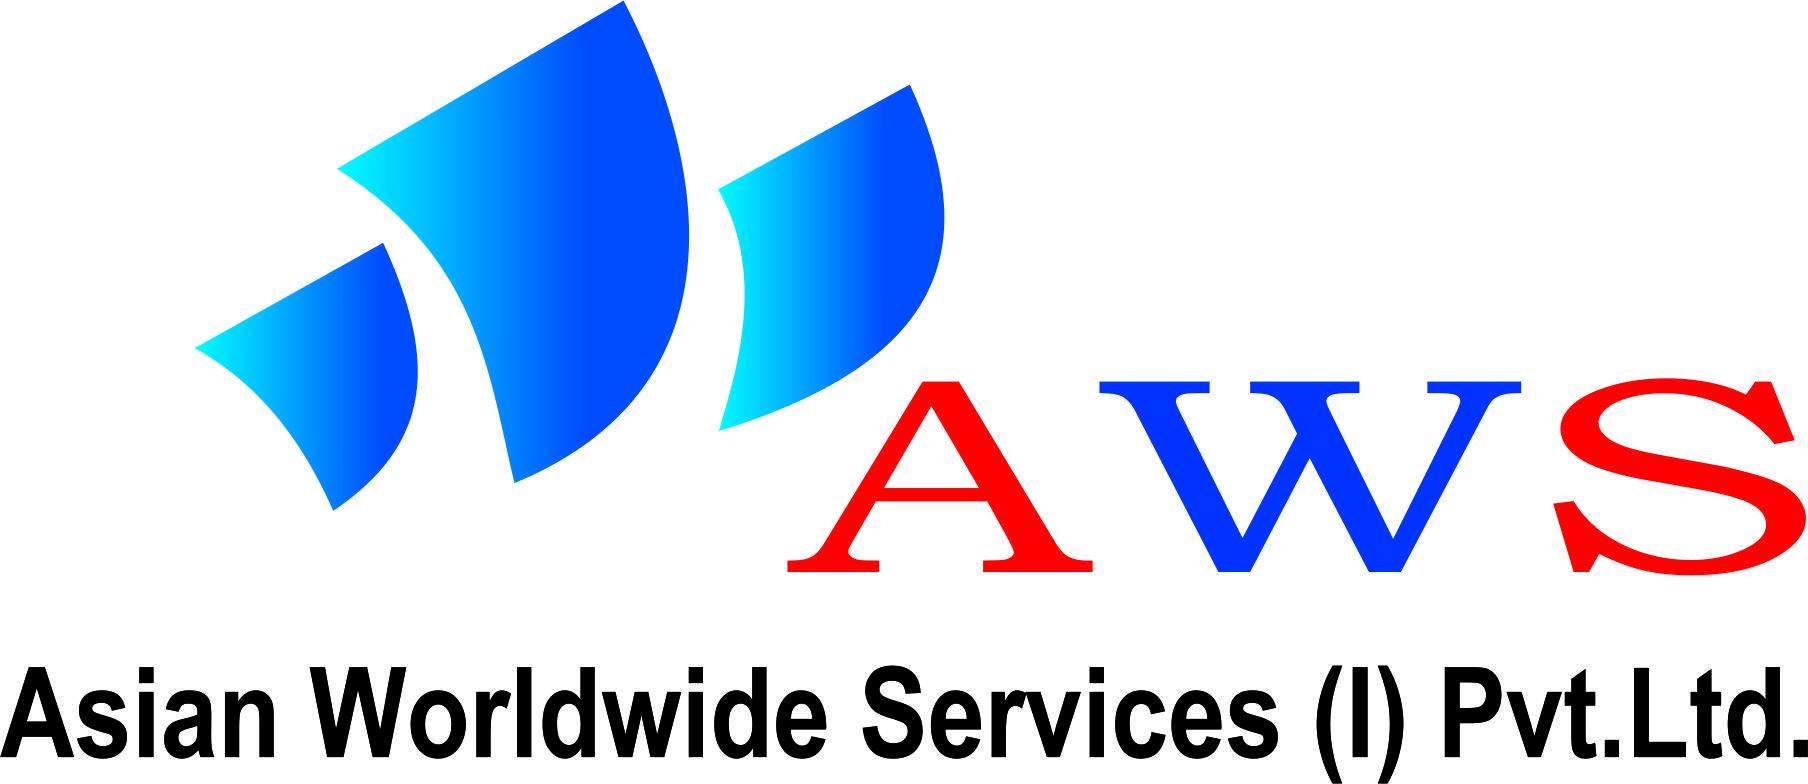 Asian Worldwide Services India Pvt. Ltd.